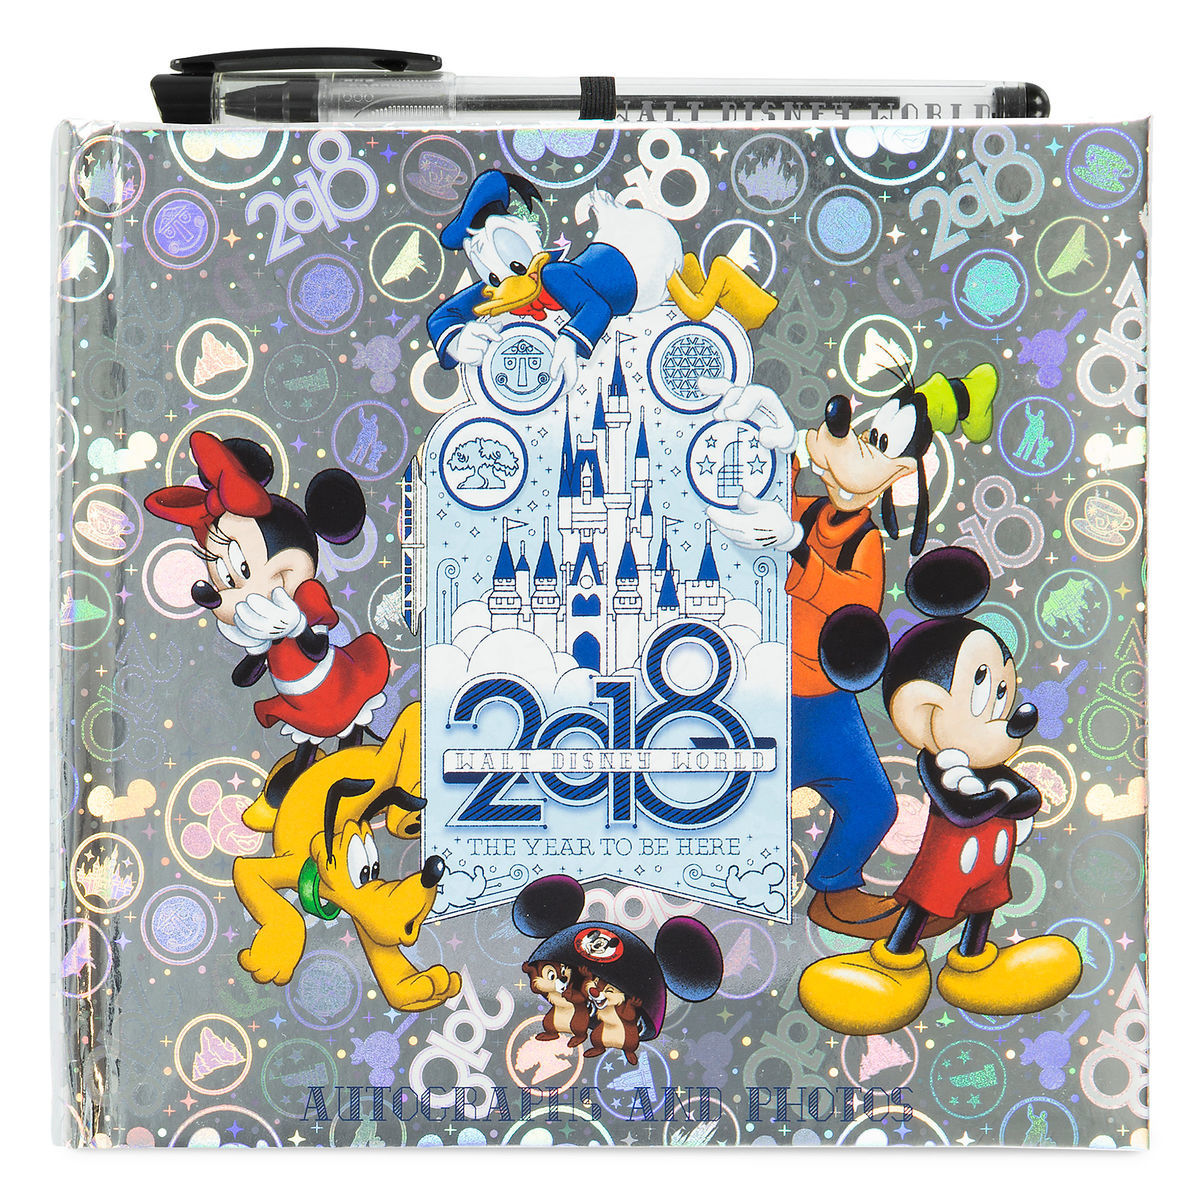 Walt Disney World Autograph And Photo Album 2018 Shopdisney